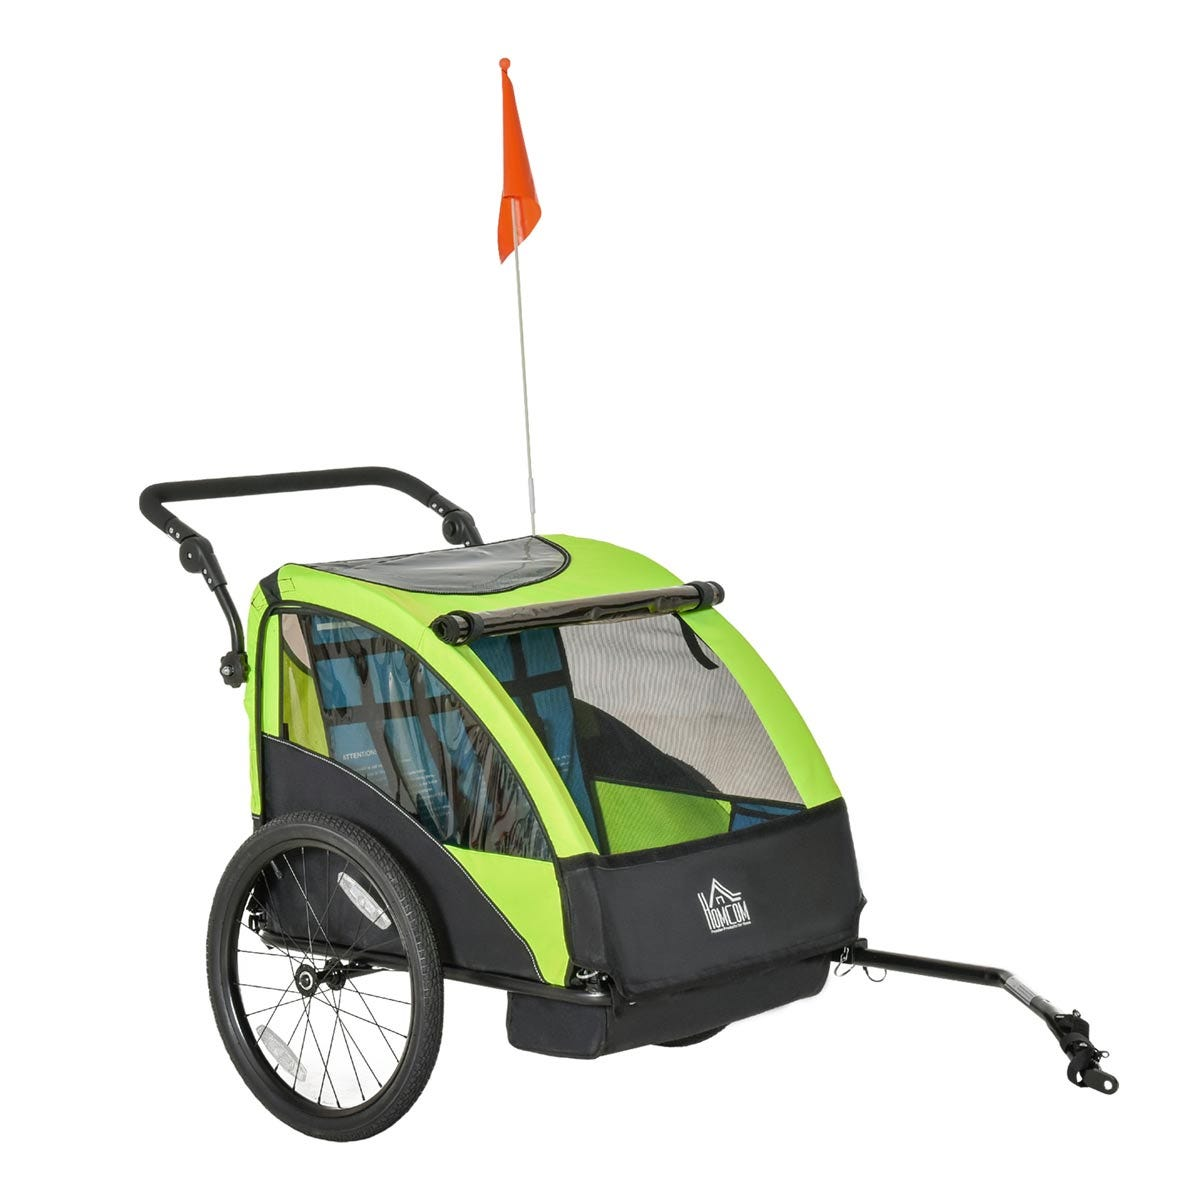 Reiten Kids 2-In-1 Foldable 2-Seater Bike Trailer & Stroller with Adjustable Handlebar - Black/Green